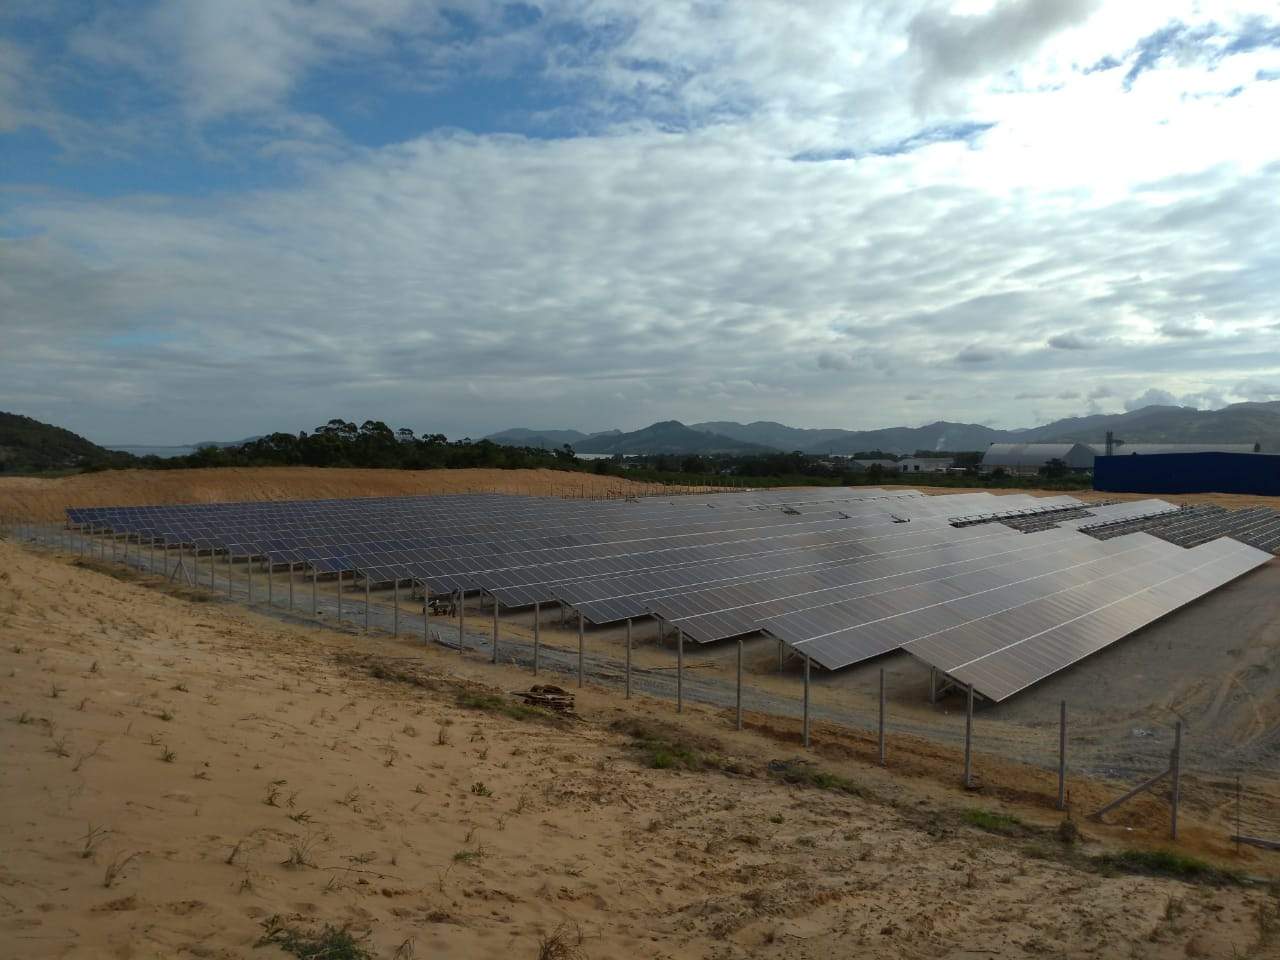 Nova planta de energia solar em Imbituba/SC